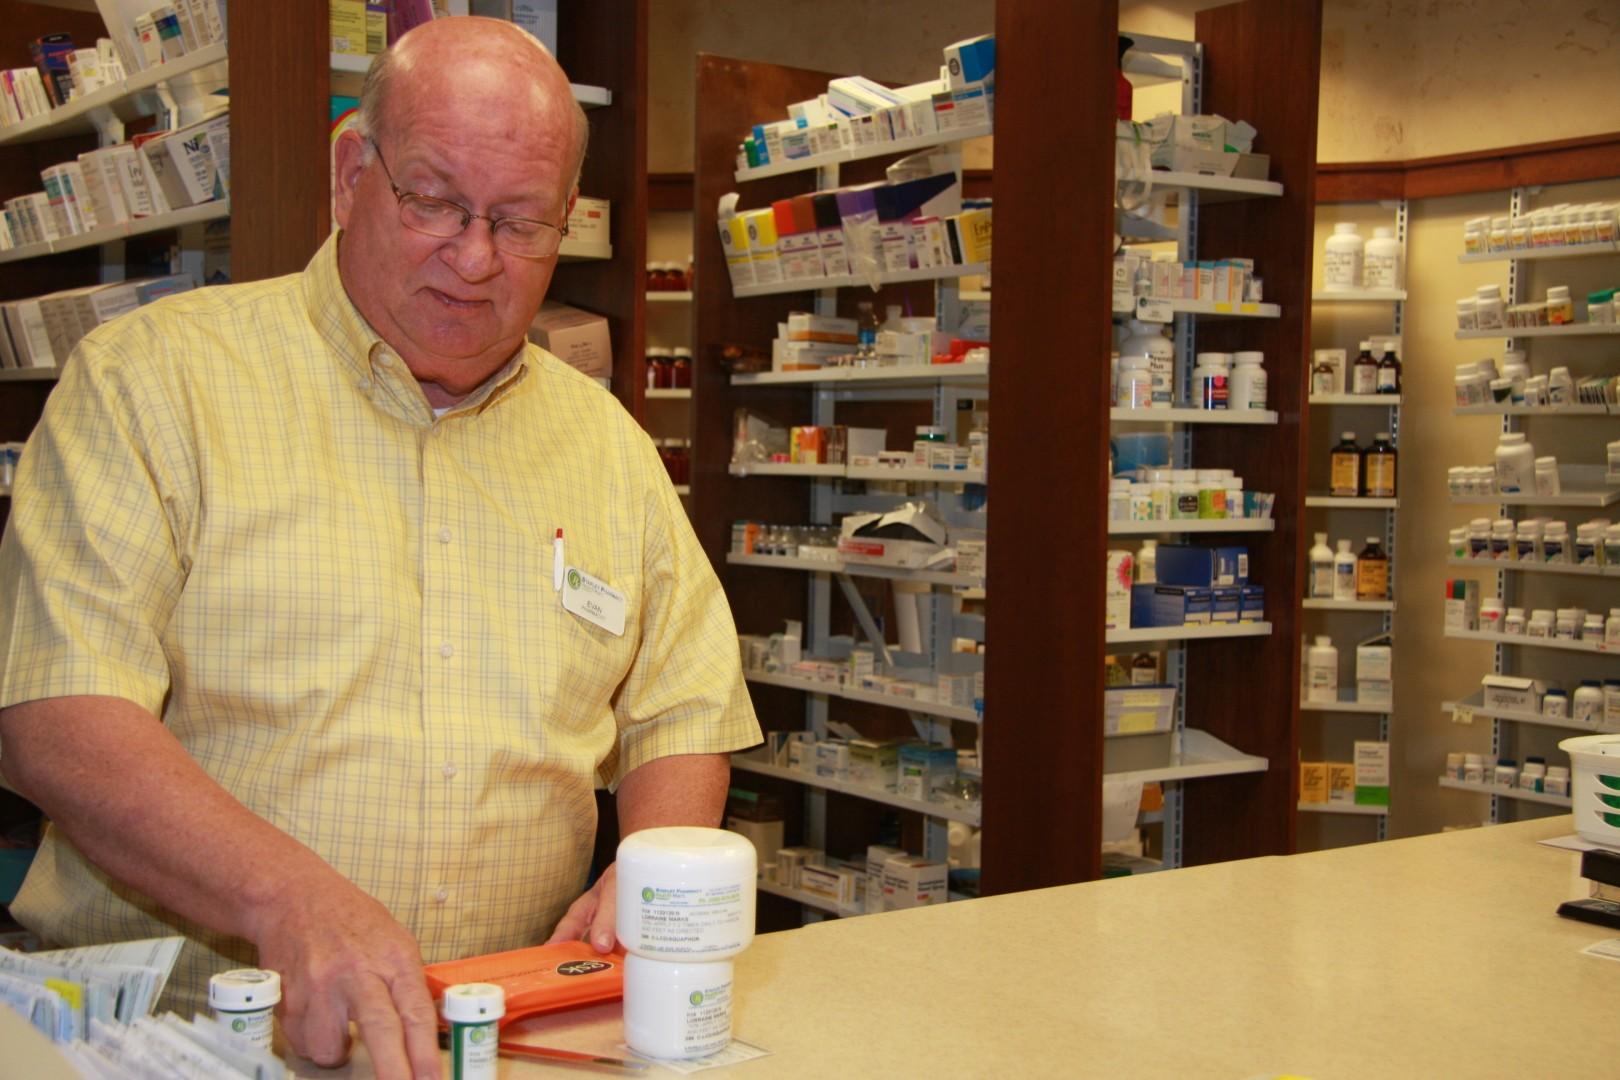 Evan Stapley, owner,  Stapley Family Pharmacy, St. George, Utah, May 2013 | Photo by Melynda Thorpe Burt, St. George News